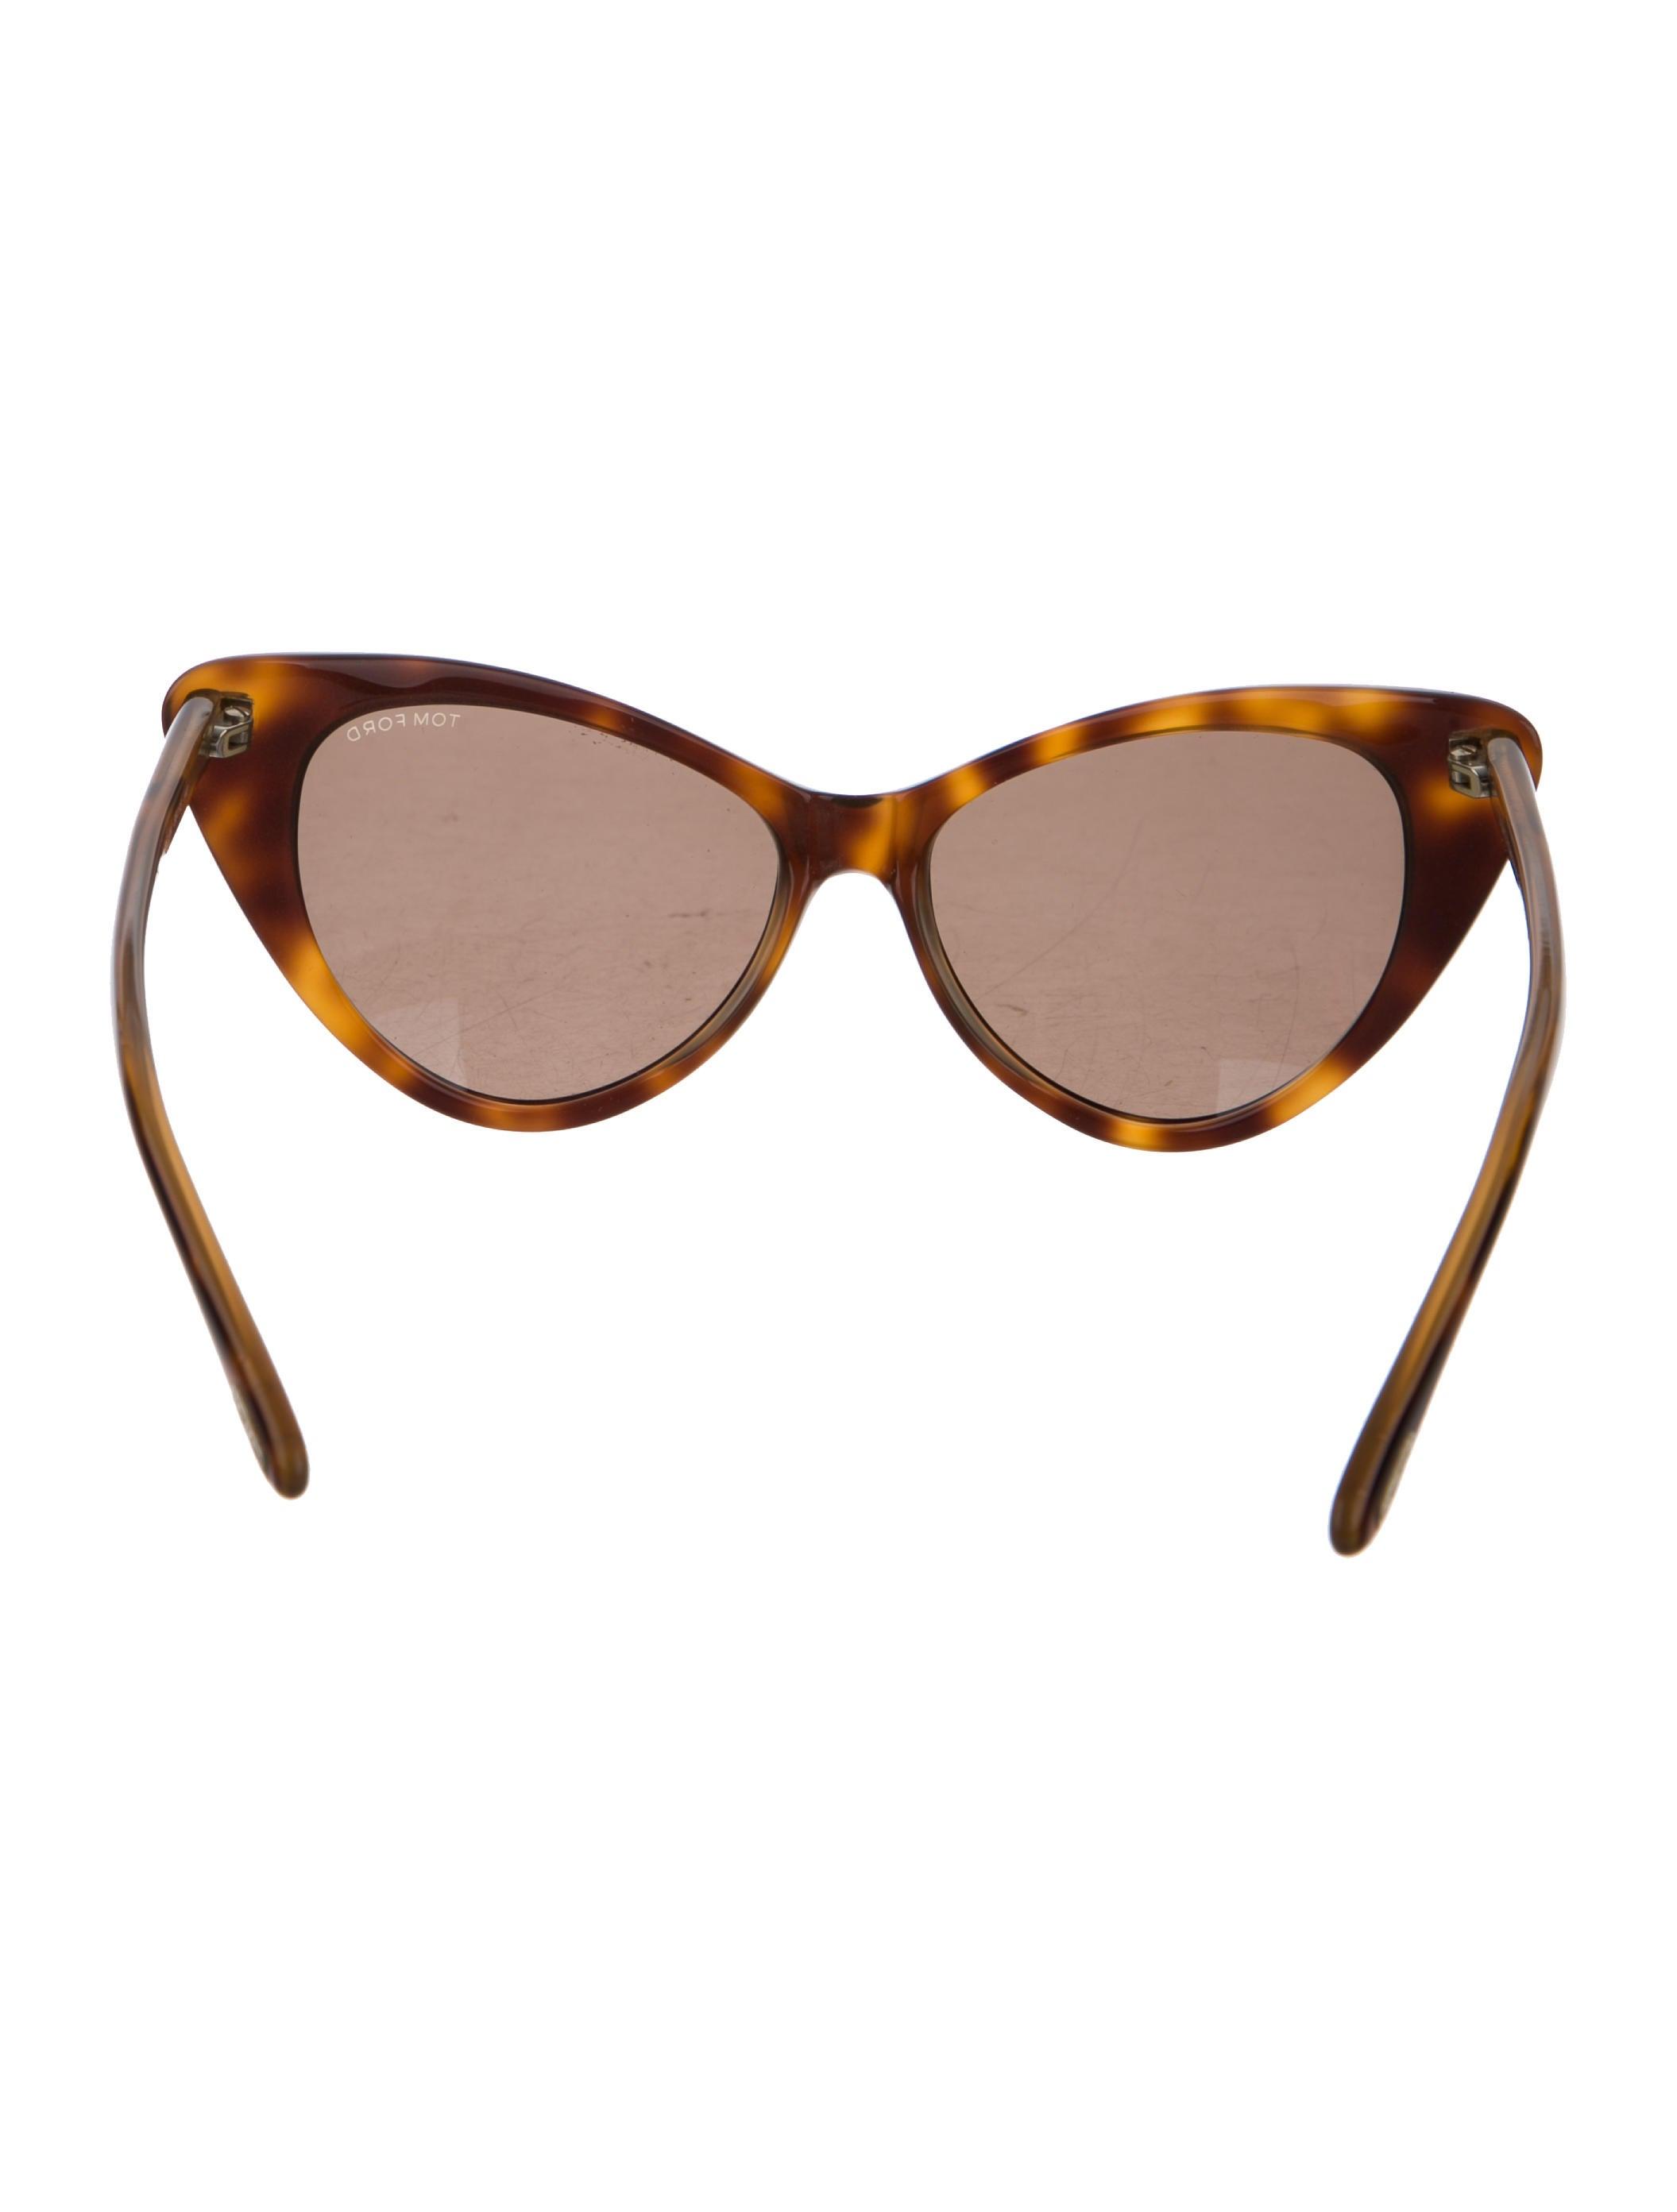 Tom ford sunglasses cat eye